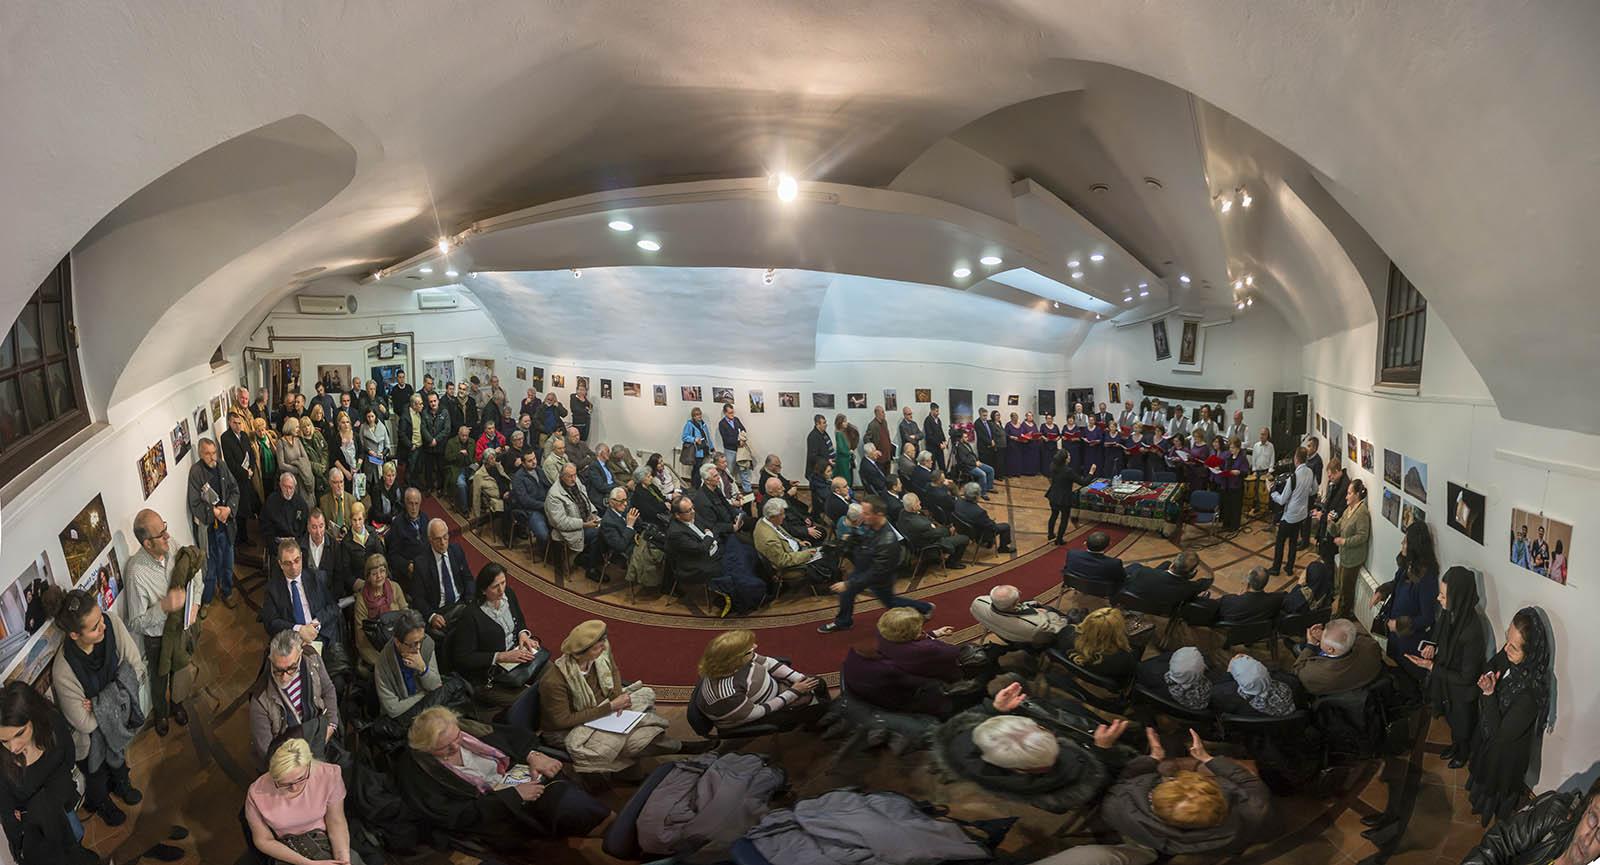 Izlozba Fotografije Čuj, Iran I Tribina (1)